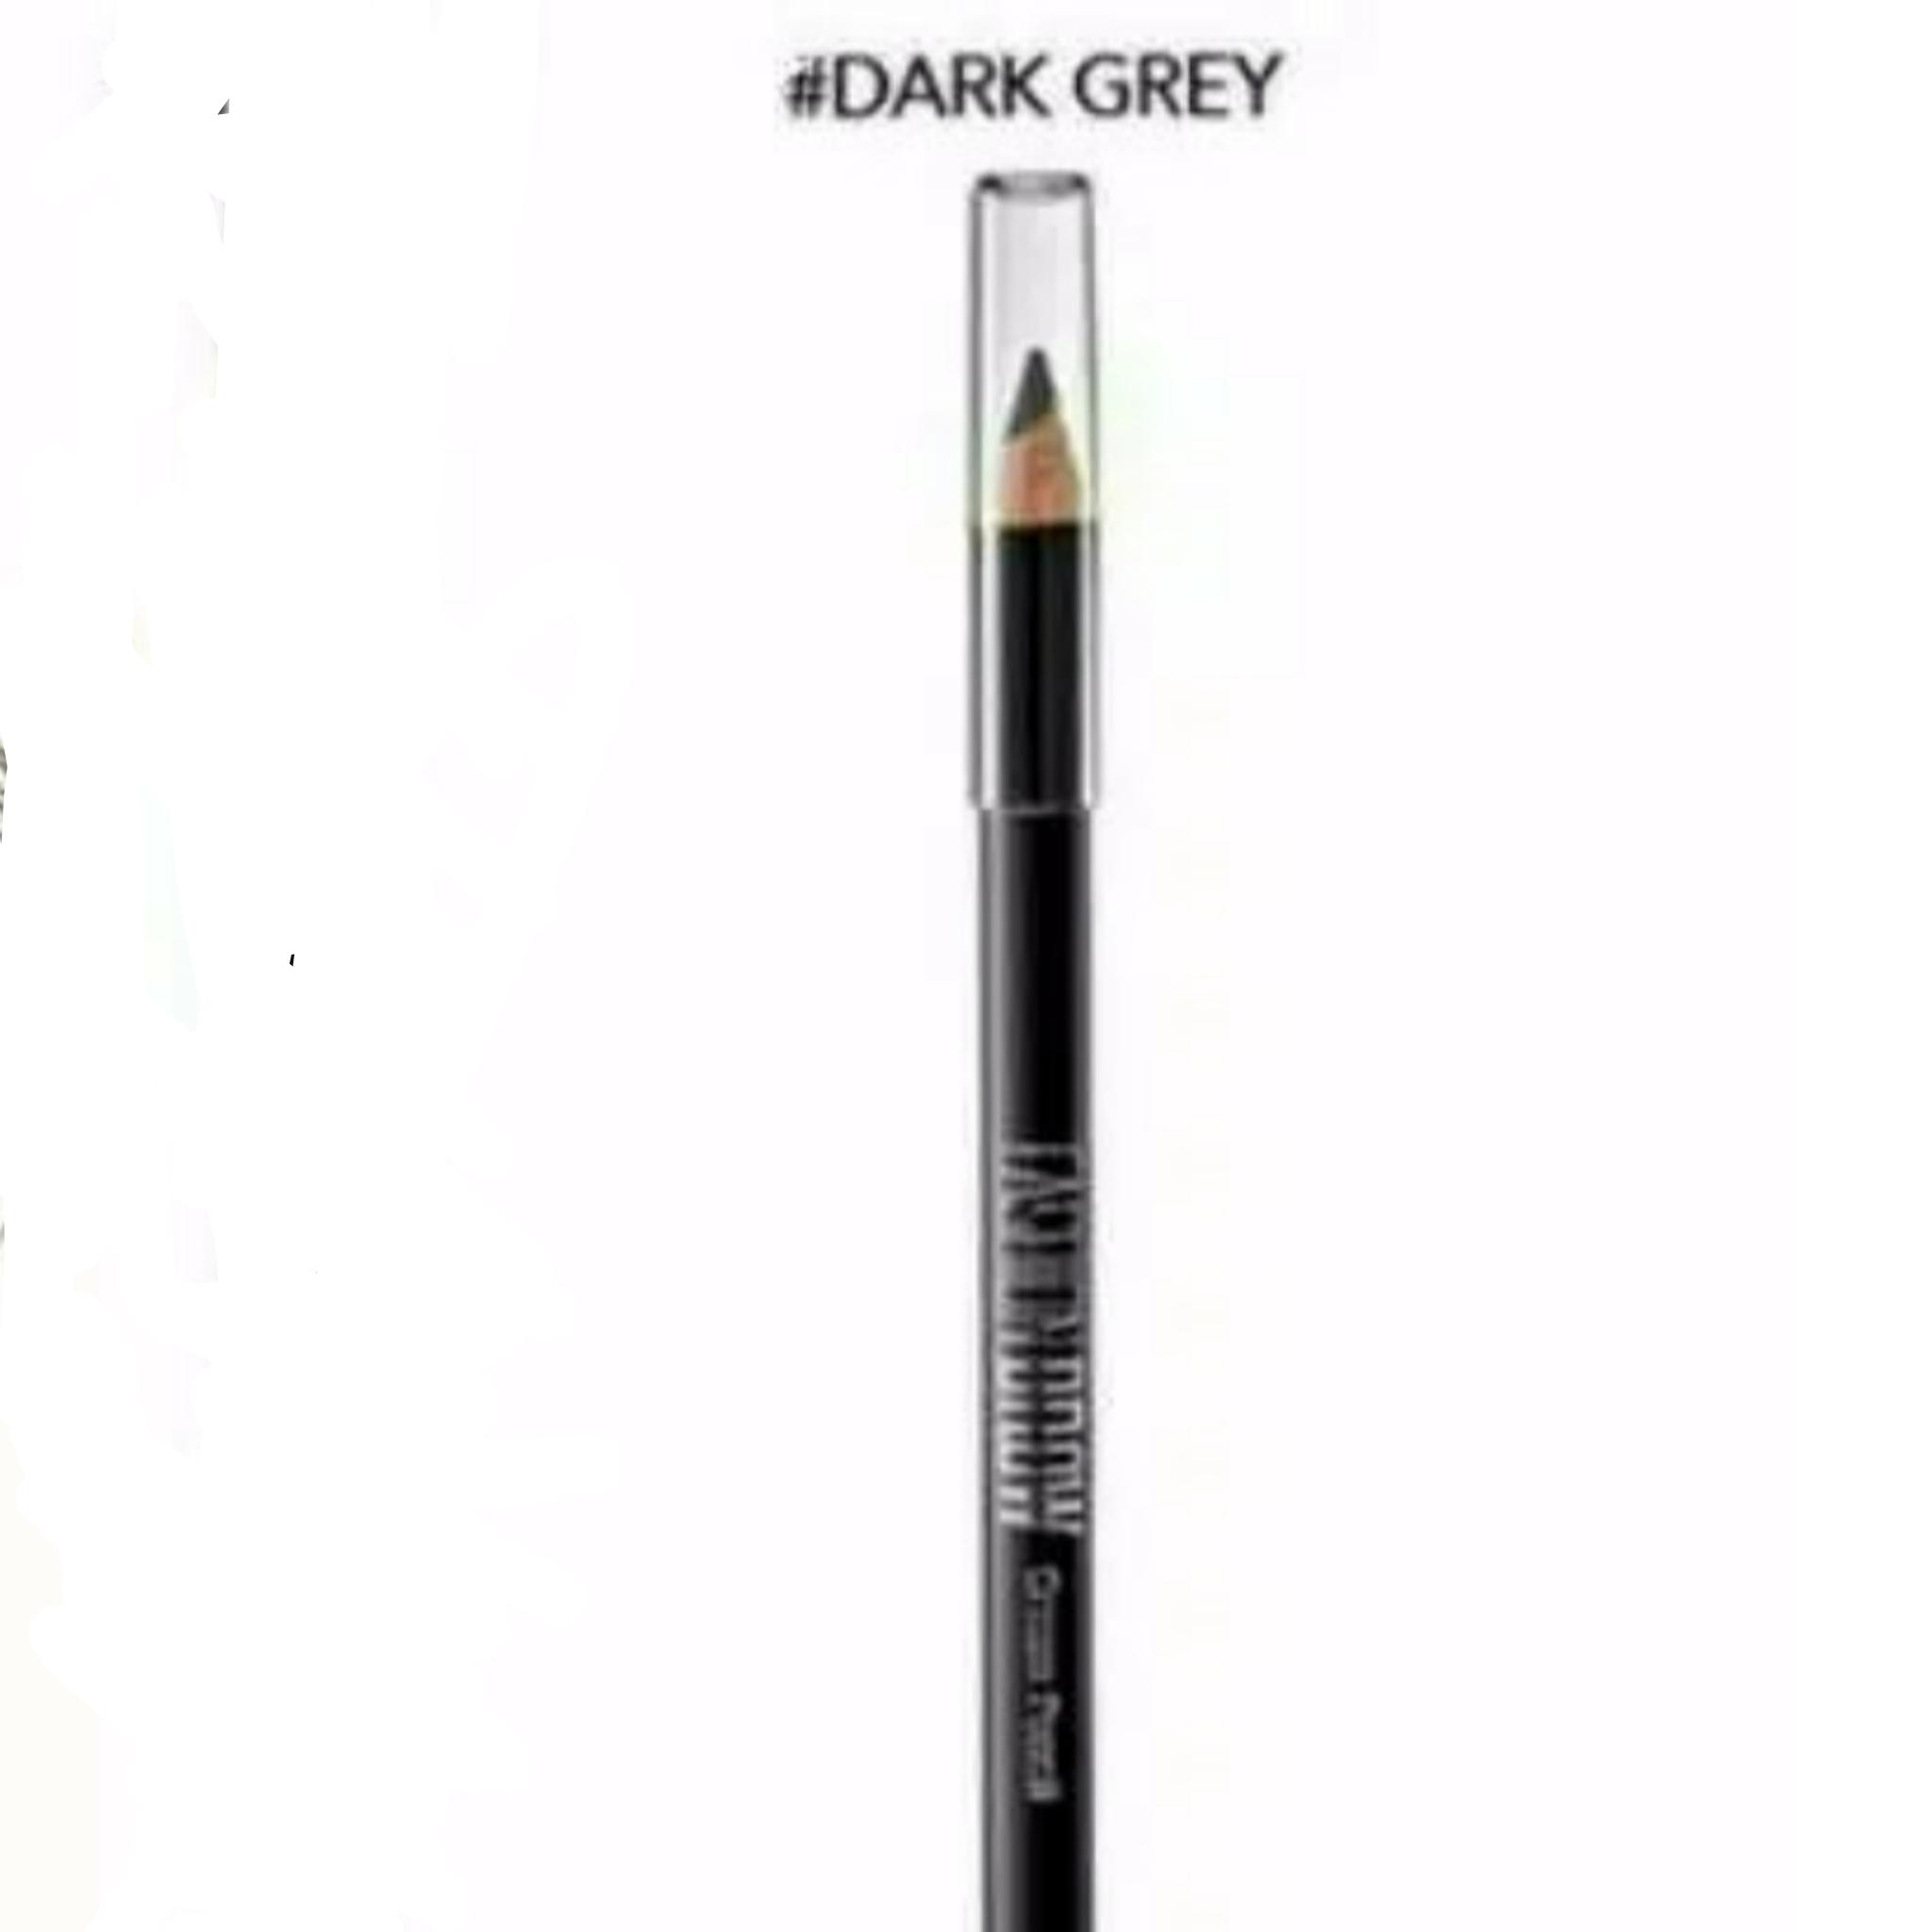 Maybelline Fashion Brow Cream Pencil Alis - -DARK GREY thumbnail